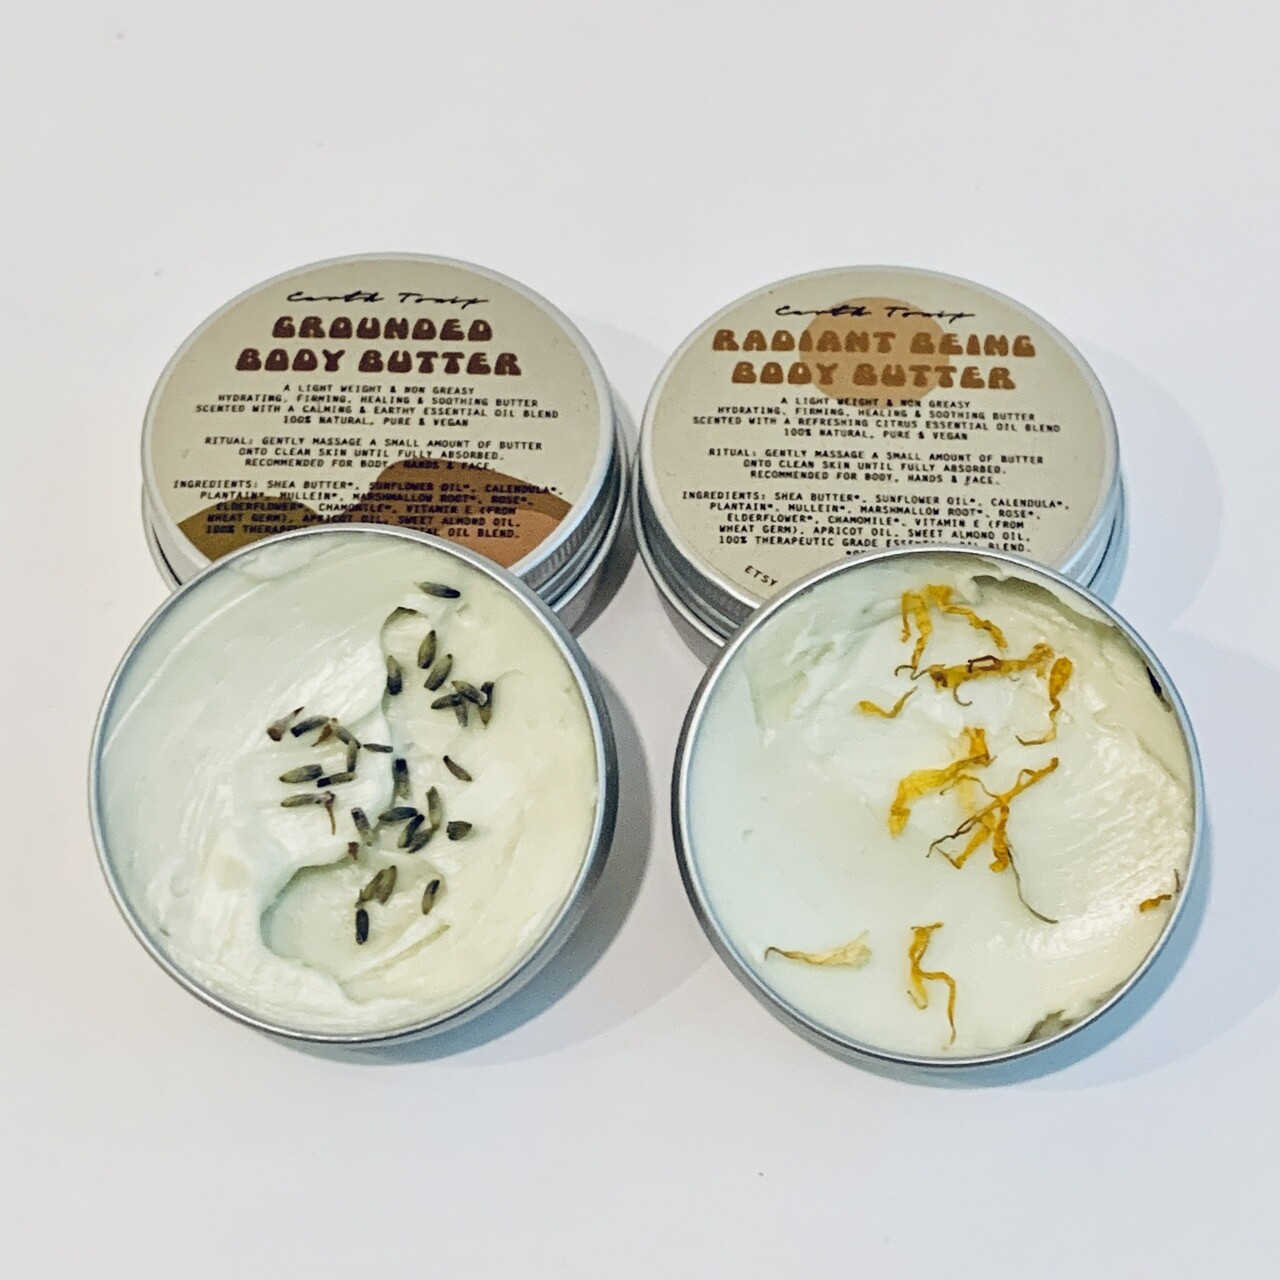 Body Butter - Earth Tonix